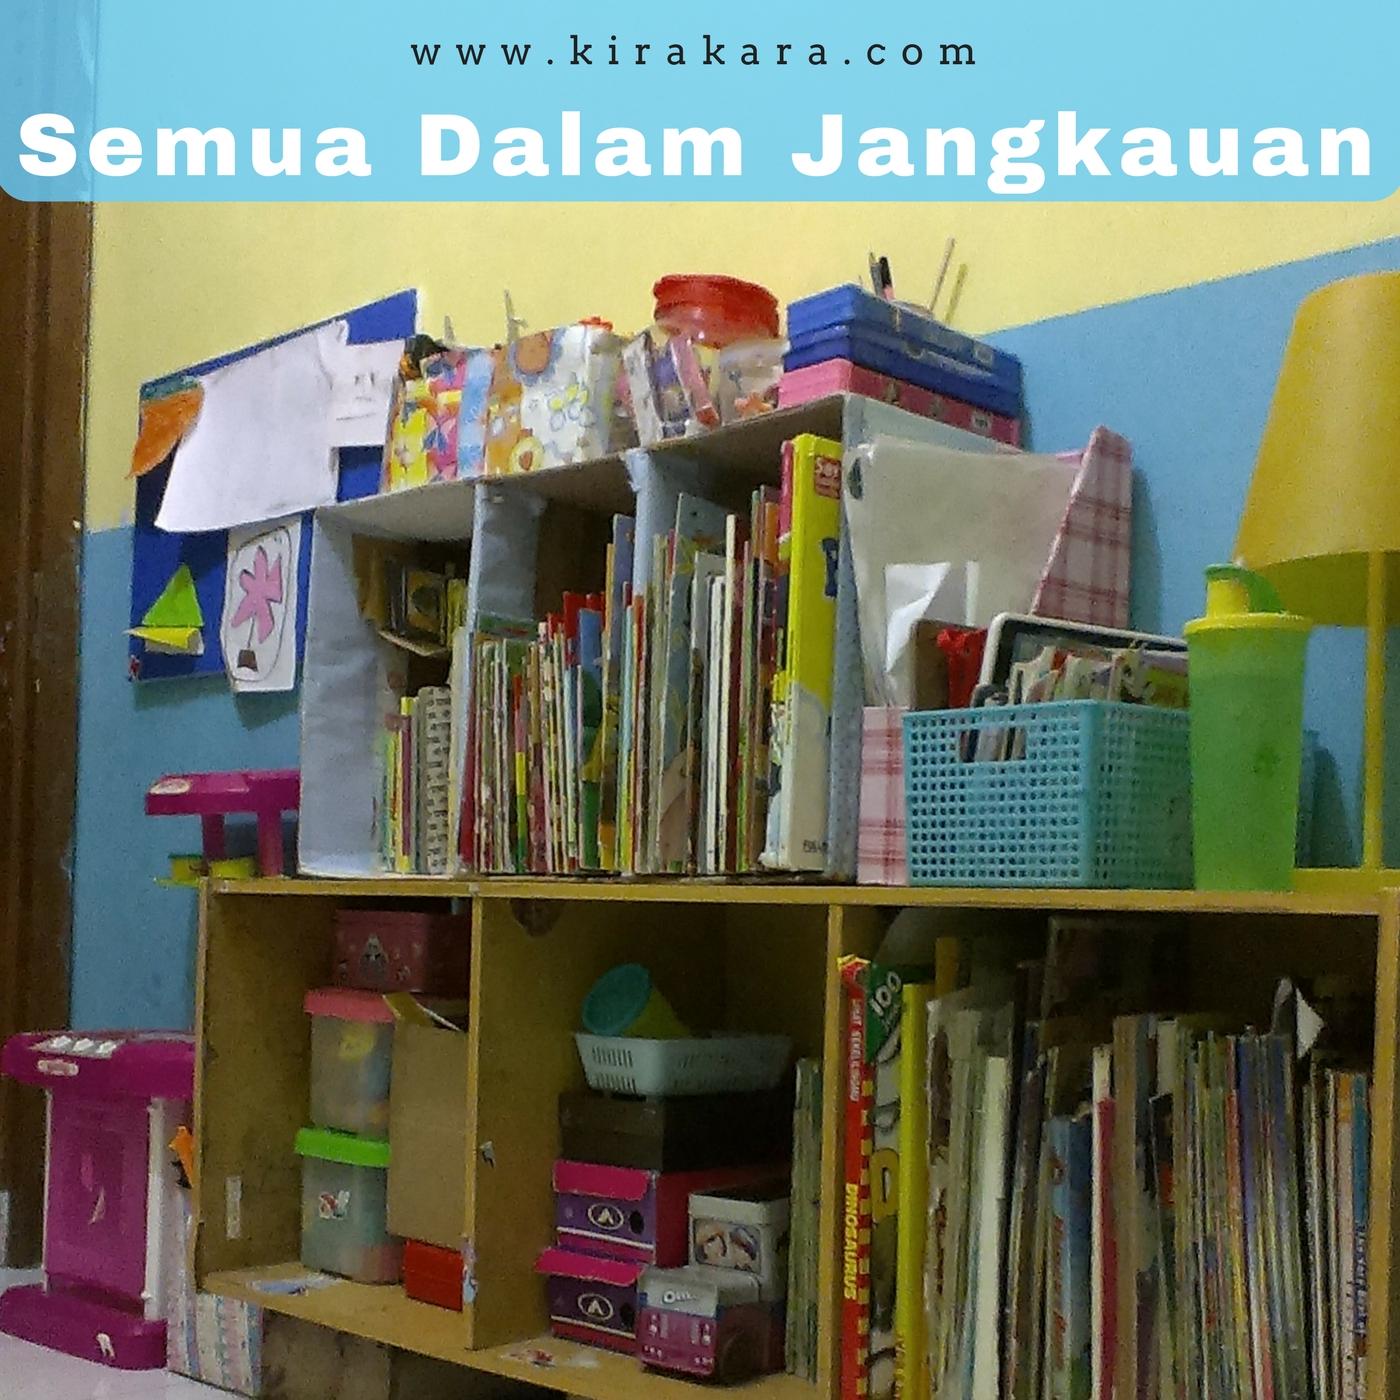 Rak buku & Mainan di kamar Kira & Kara